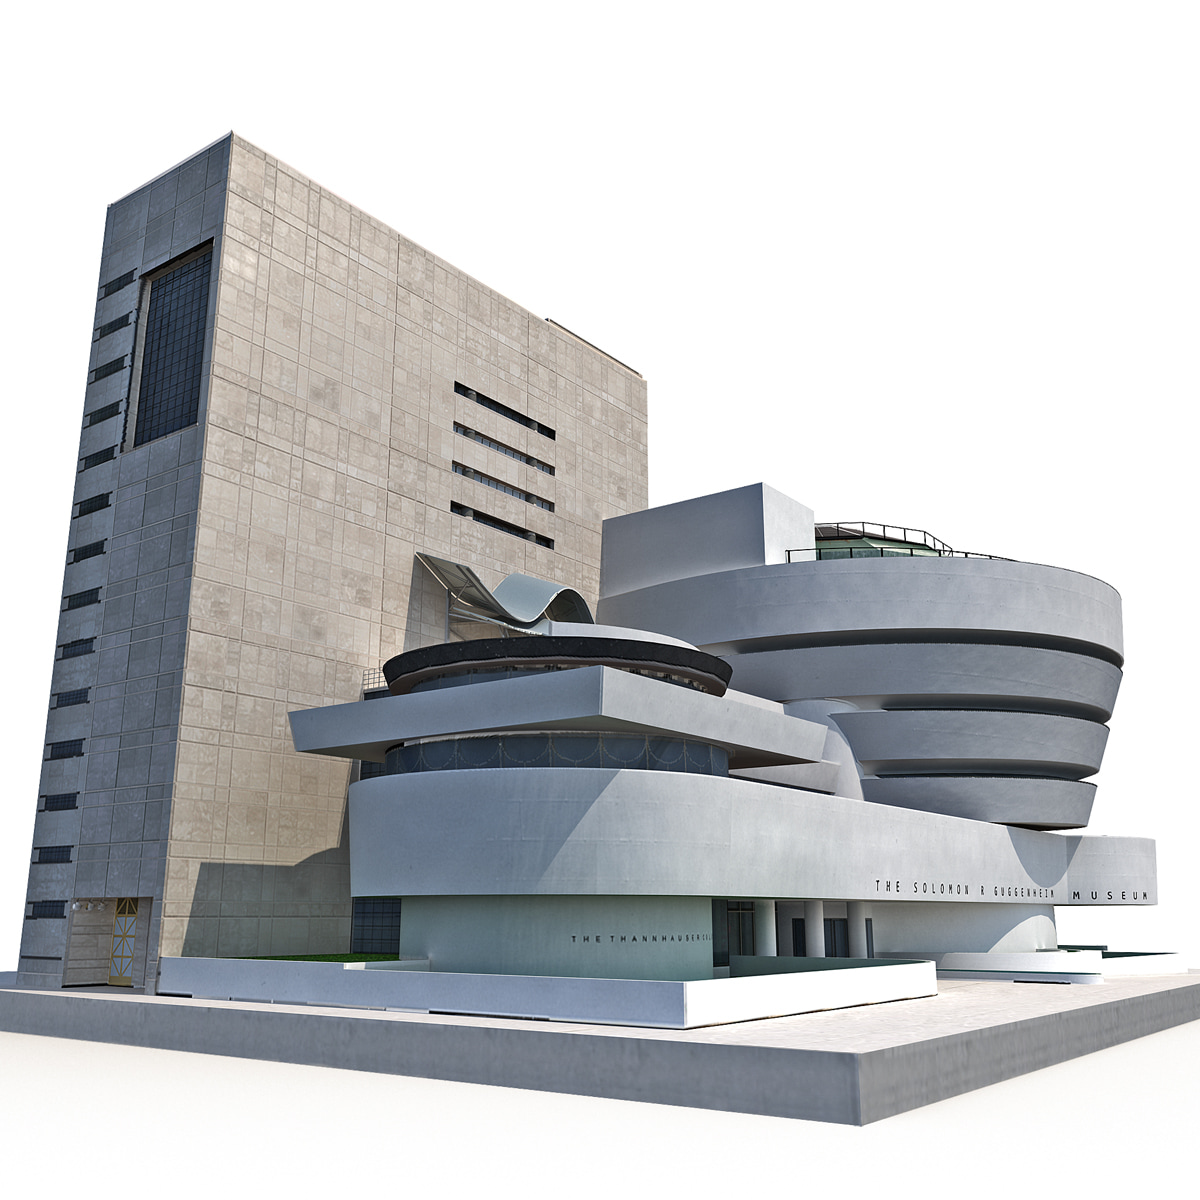 005_Guggenheim_Museum_Low_Poly.jpg